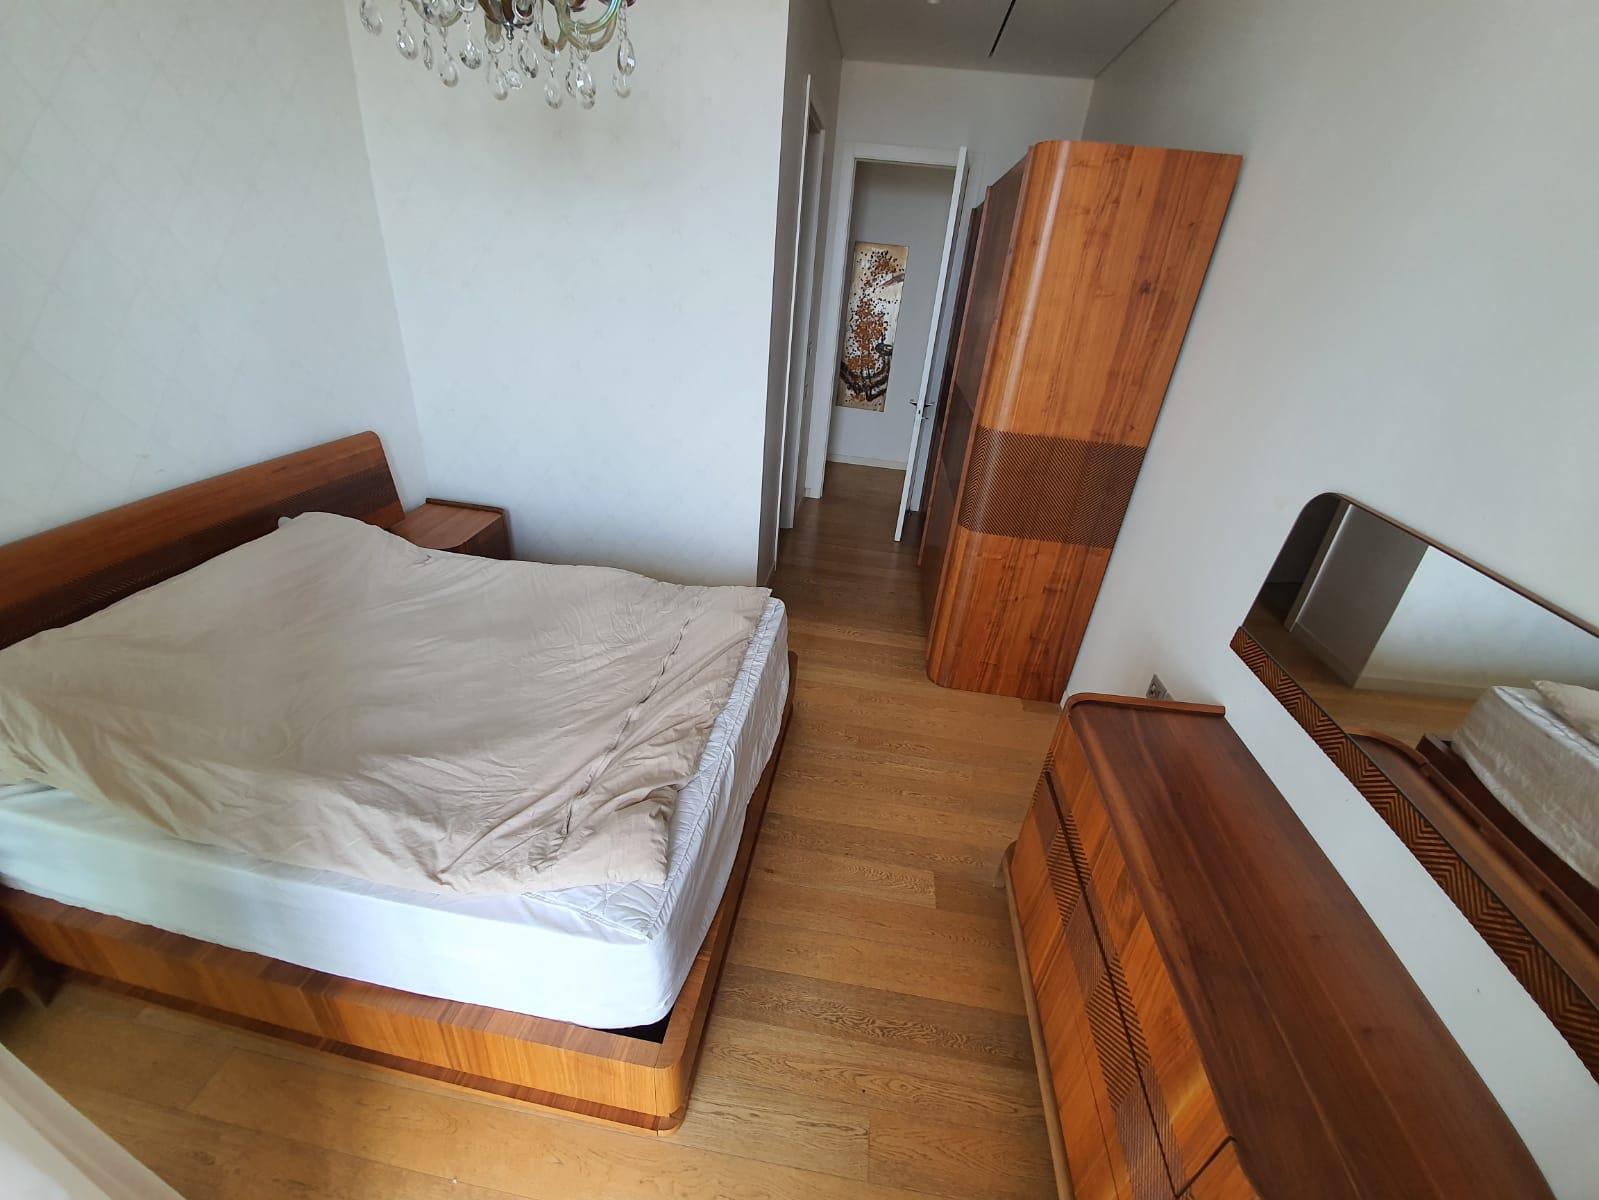 apartments-residence-sapphire-tower-11th-floor-011.jpg